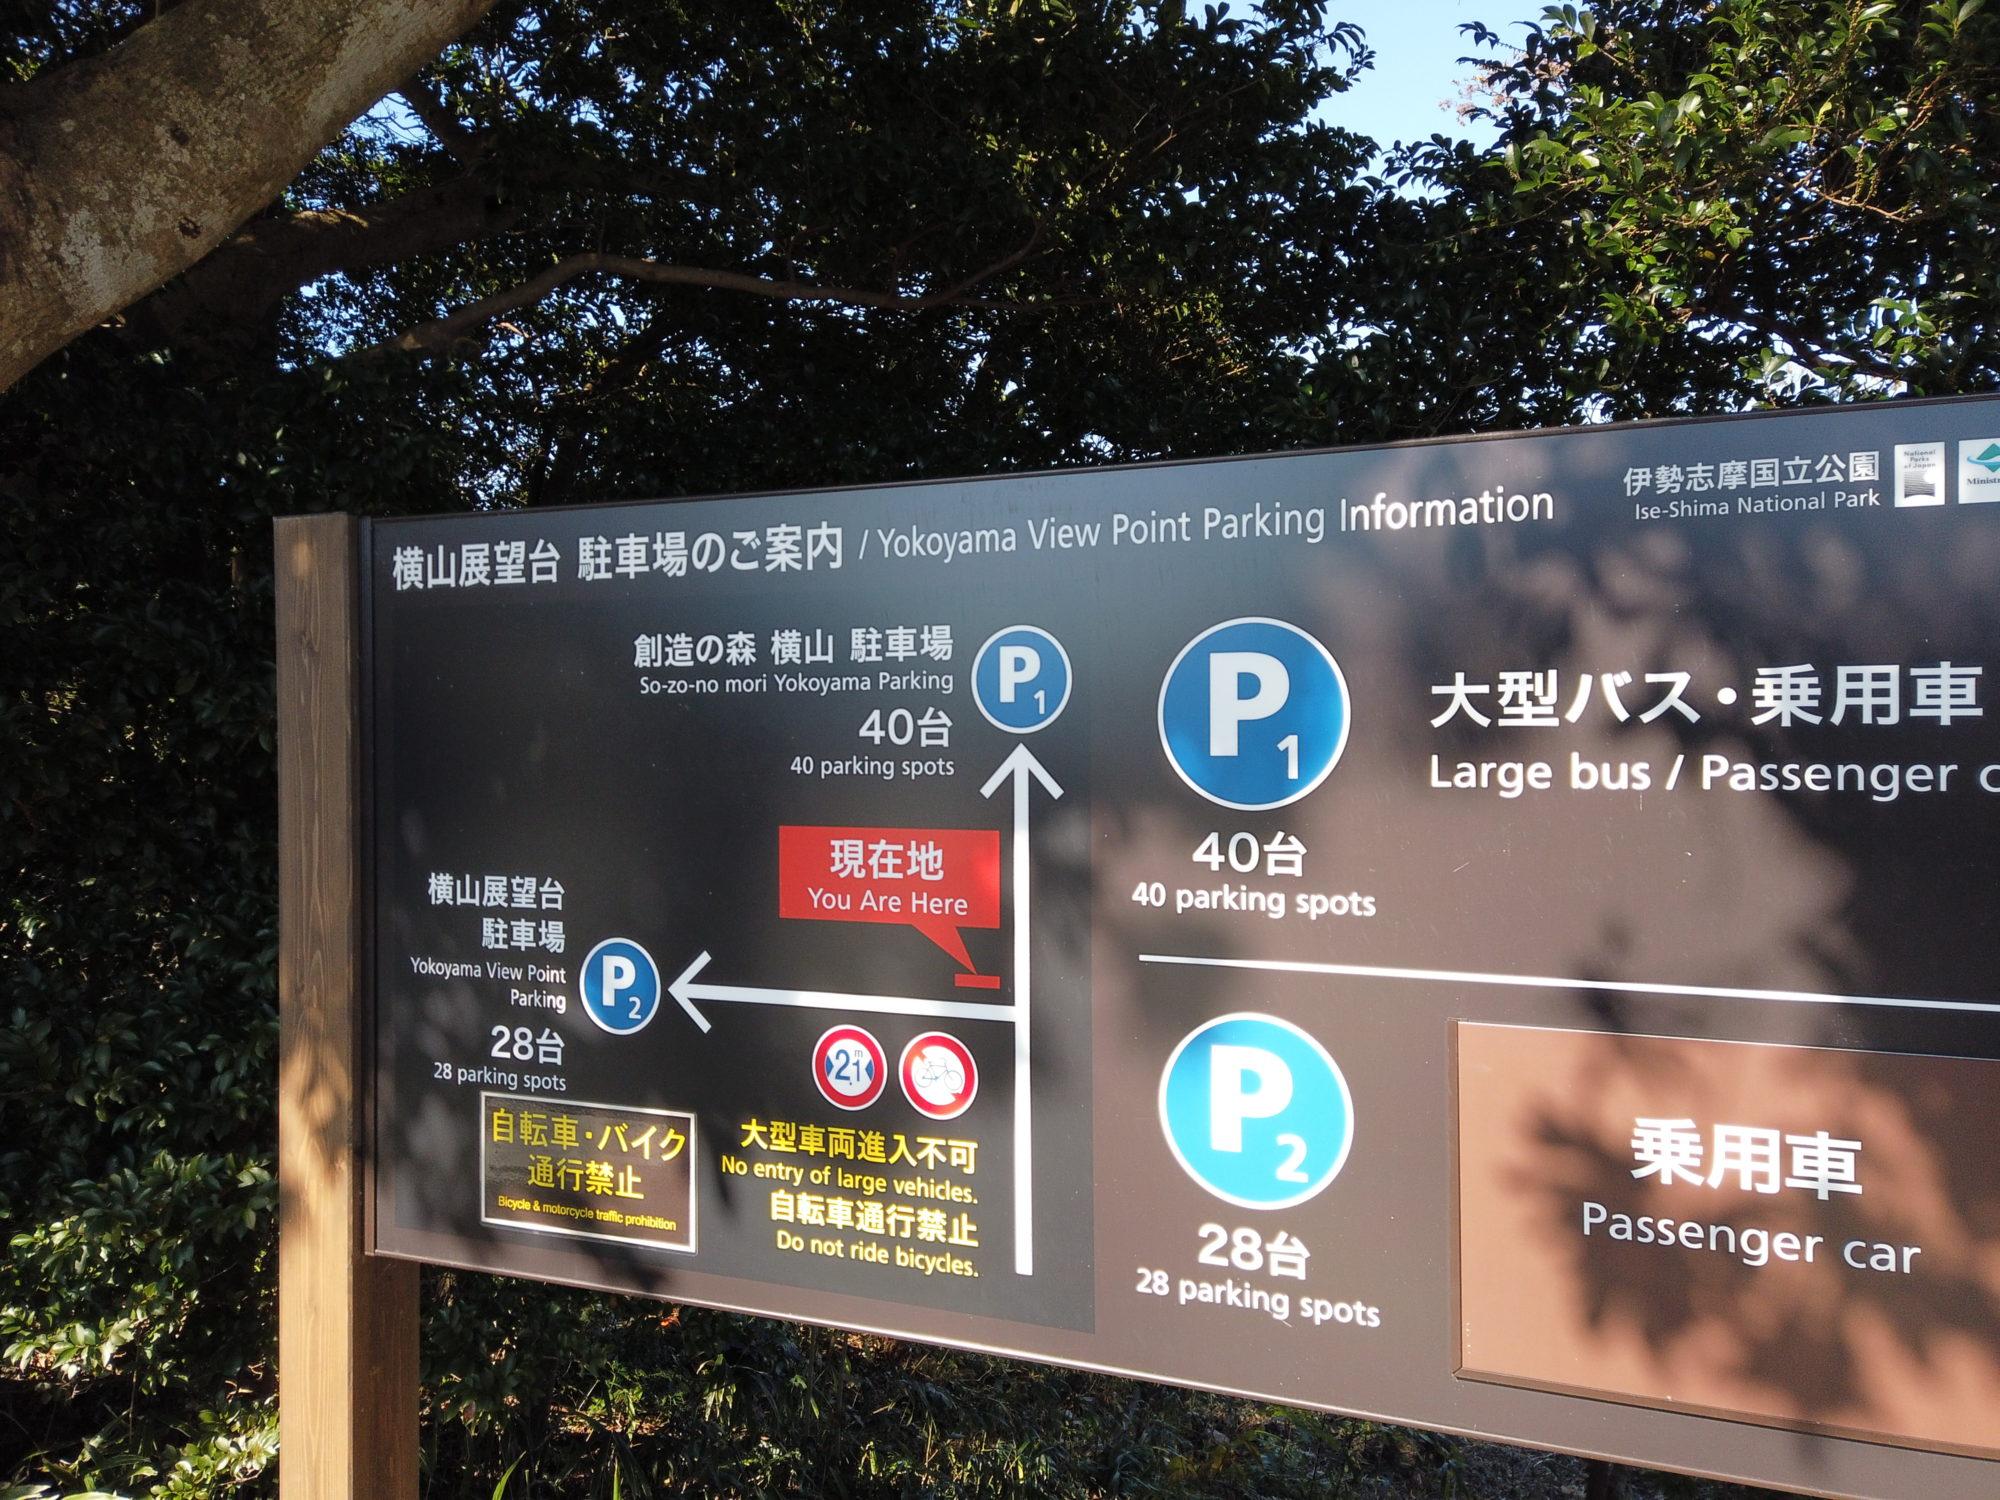 DJI_0650-e1578188820573 三重県  横山展望台 (伊勢志摩 英虞湾を一望できるおすすめの絶景写真撮影スポット!撮影した写真の紹介、アクセス情報や交通手段・駐車場などまとめ!)